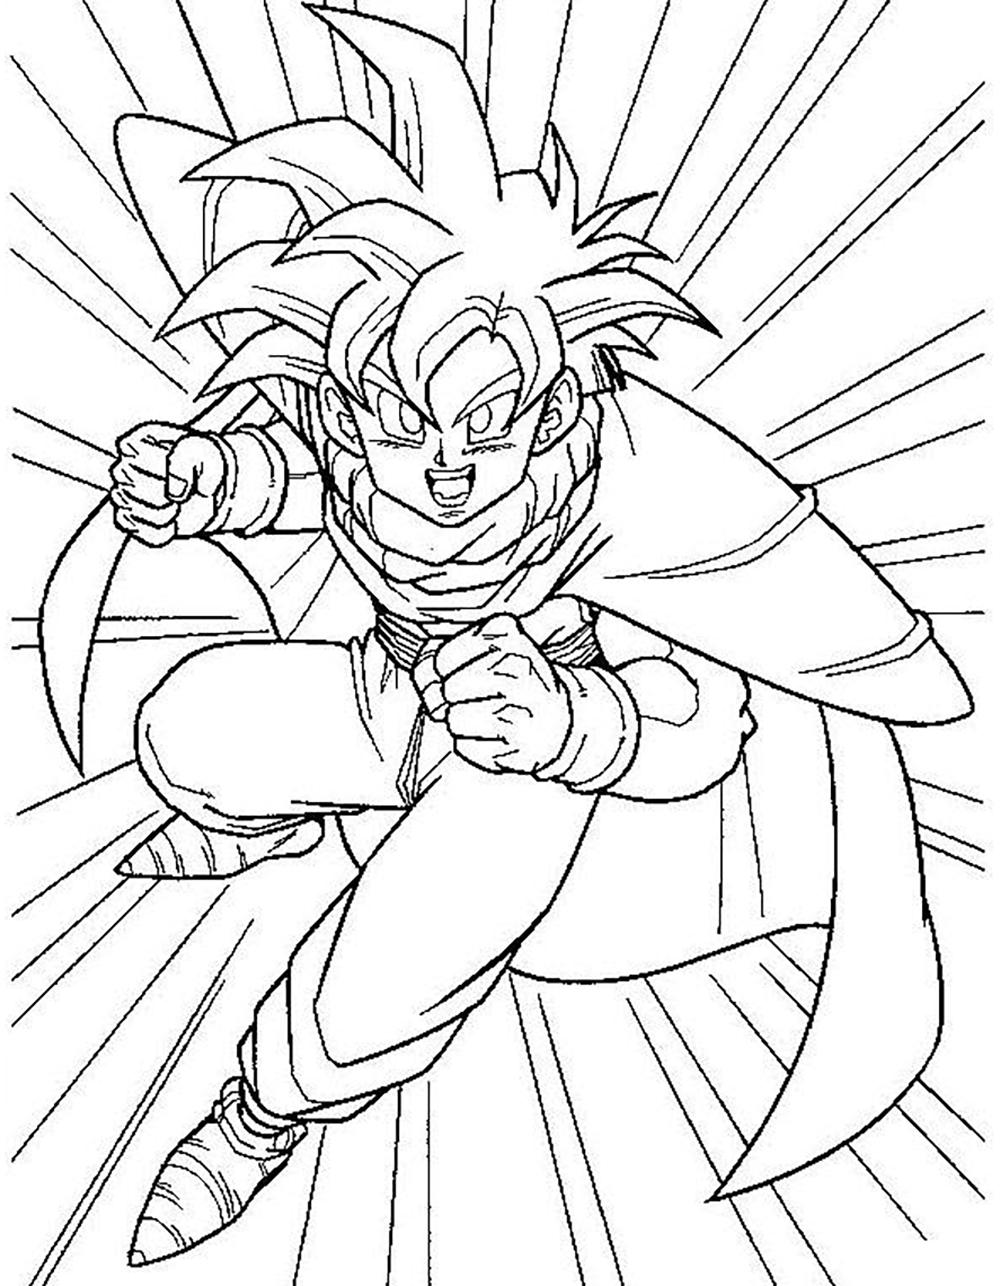 Dragon Ball Z coloring page to download : Songohan Super Saiyajin